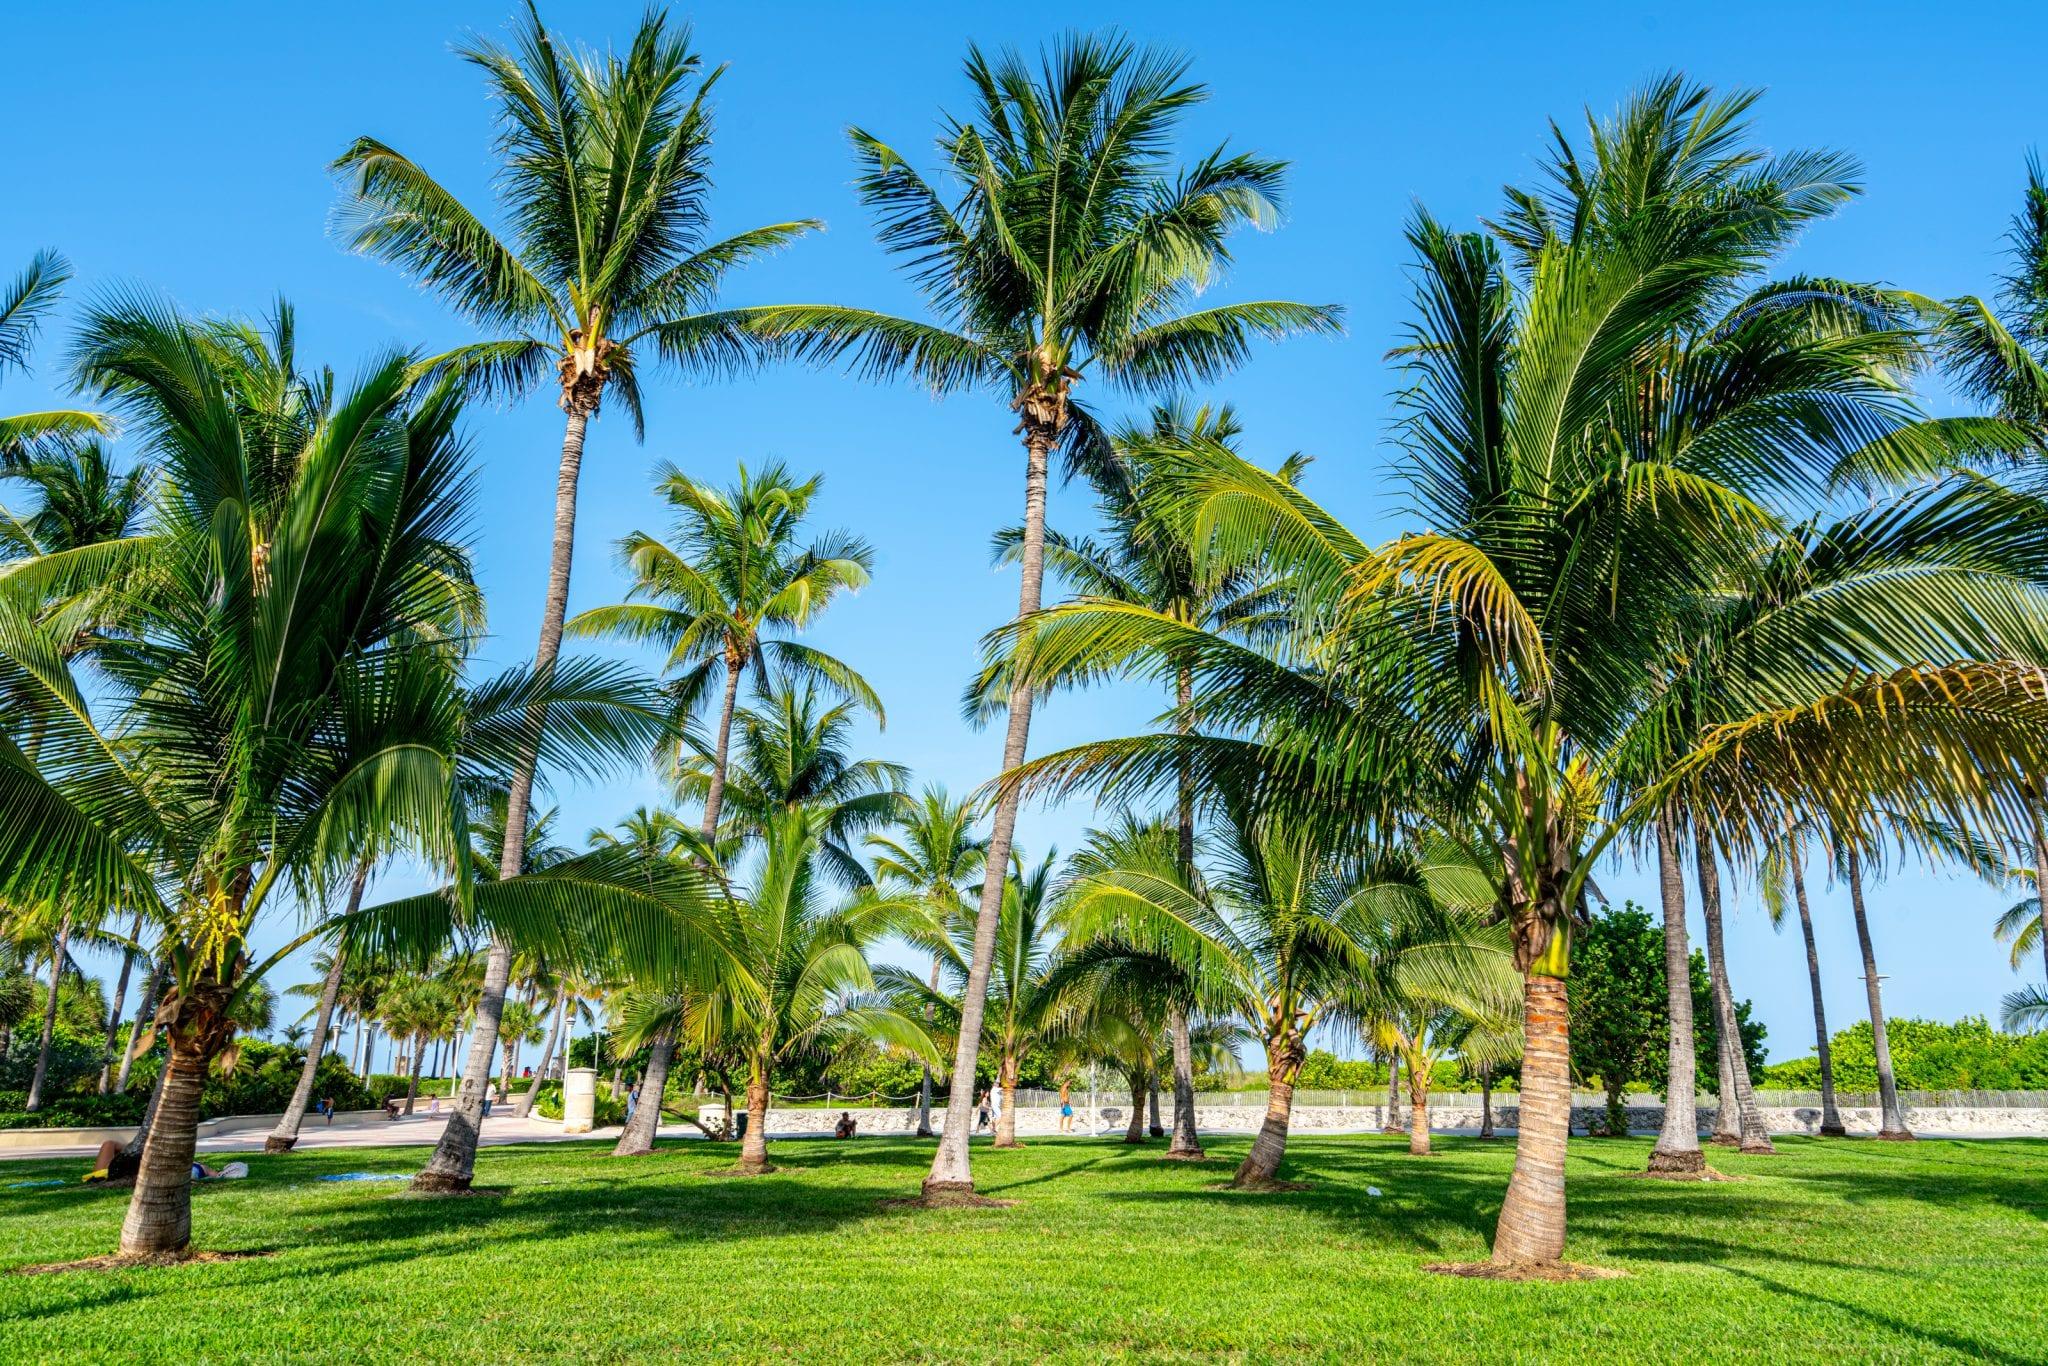 Palm trees growing on green grass in Lummus Park, Miami Beach.